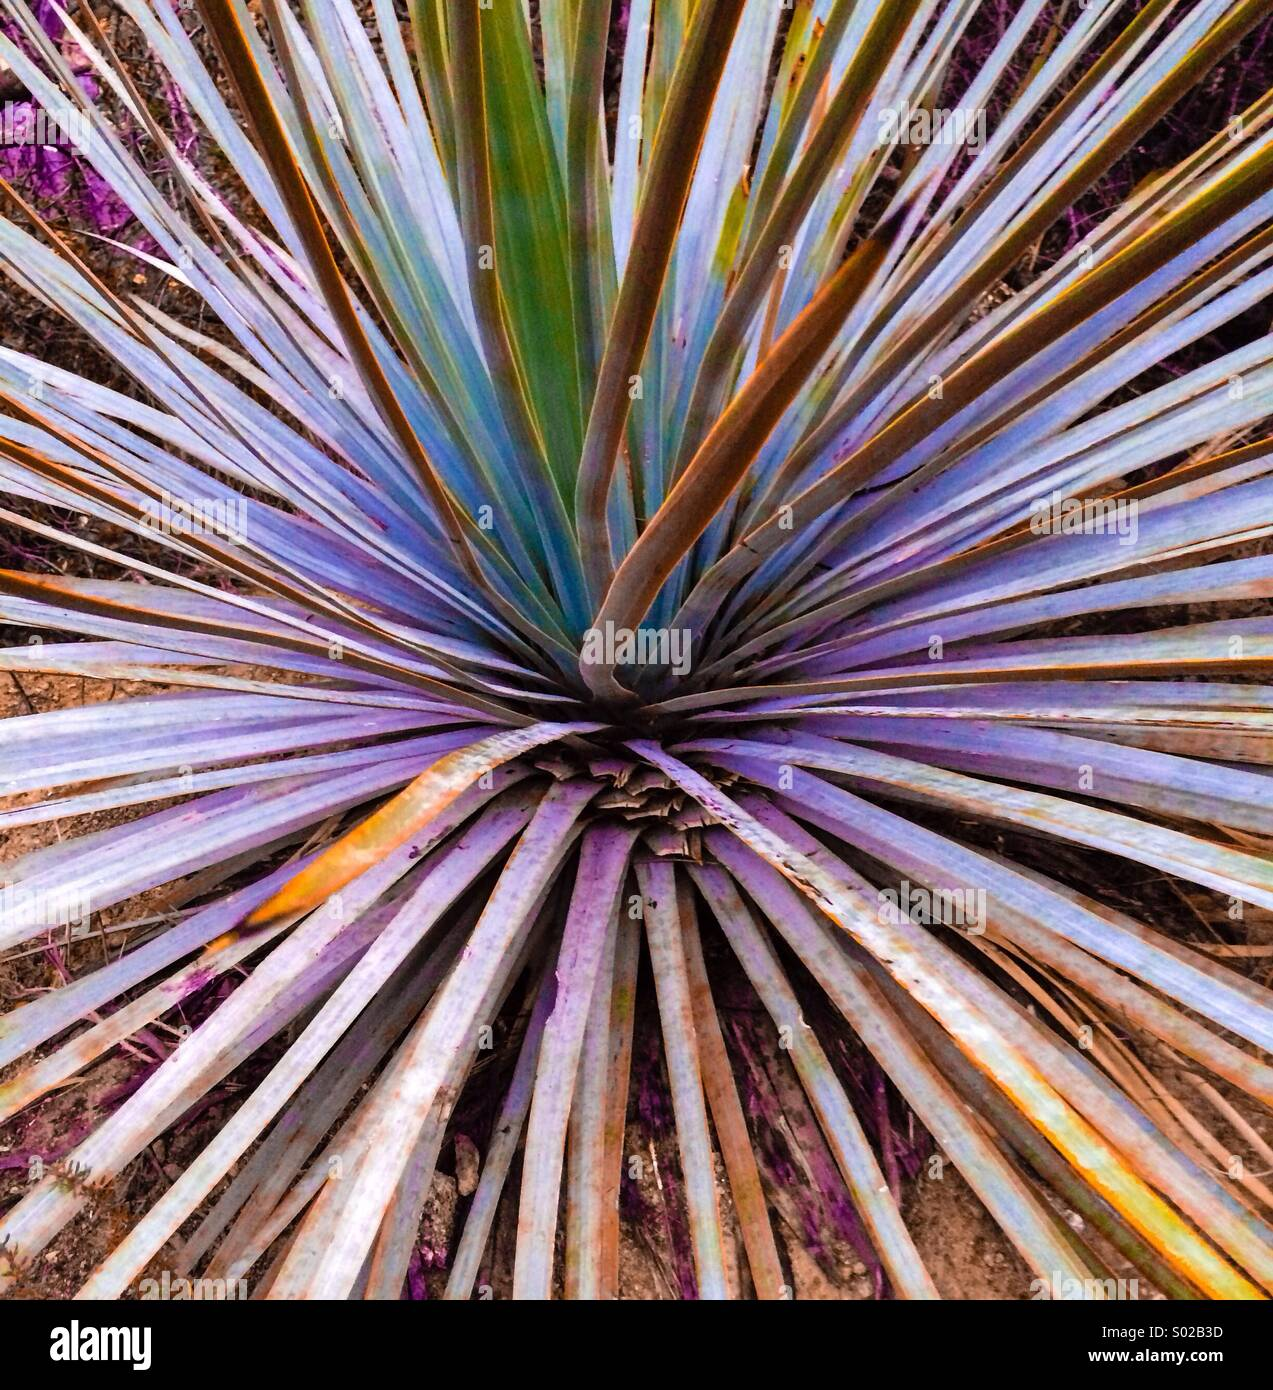 Yucca plant - Stock Image